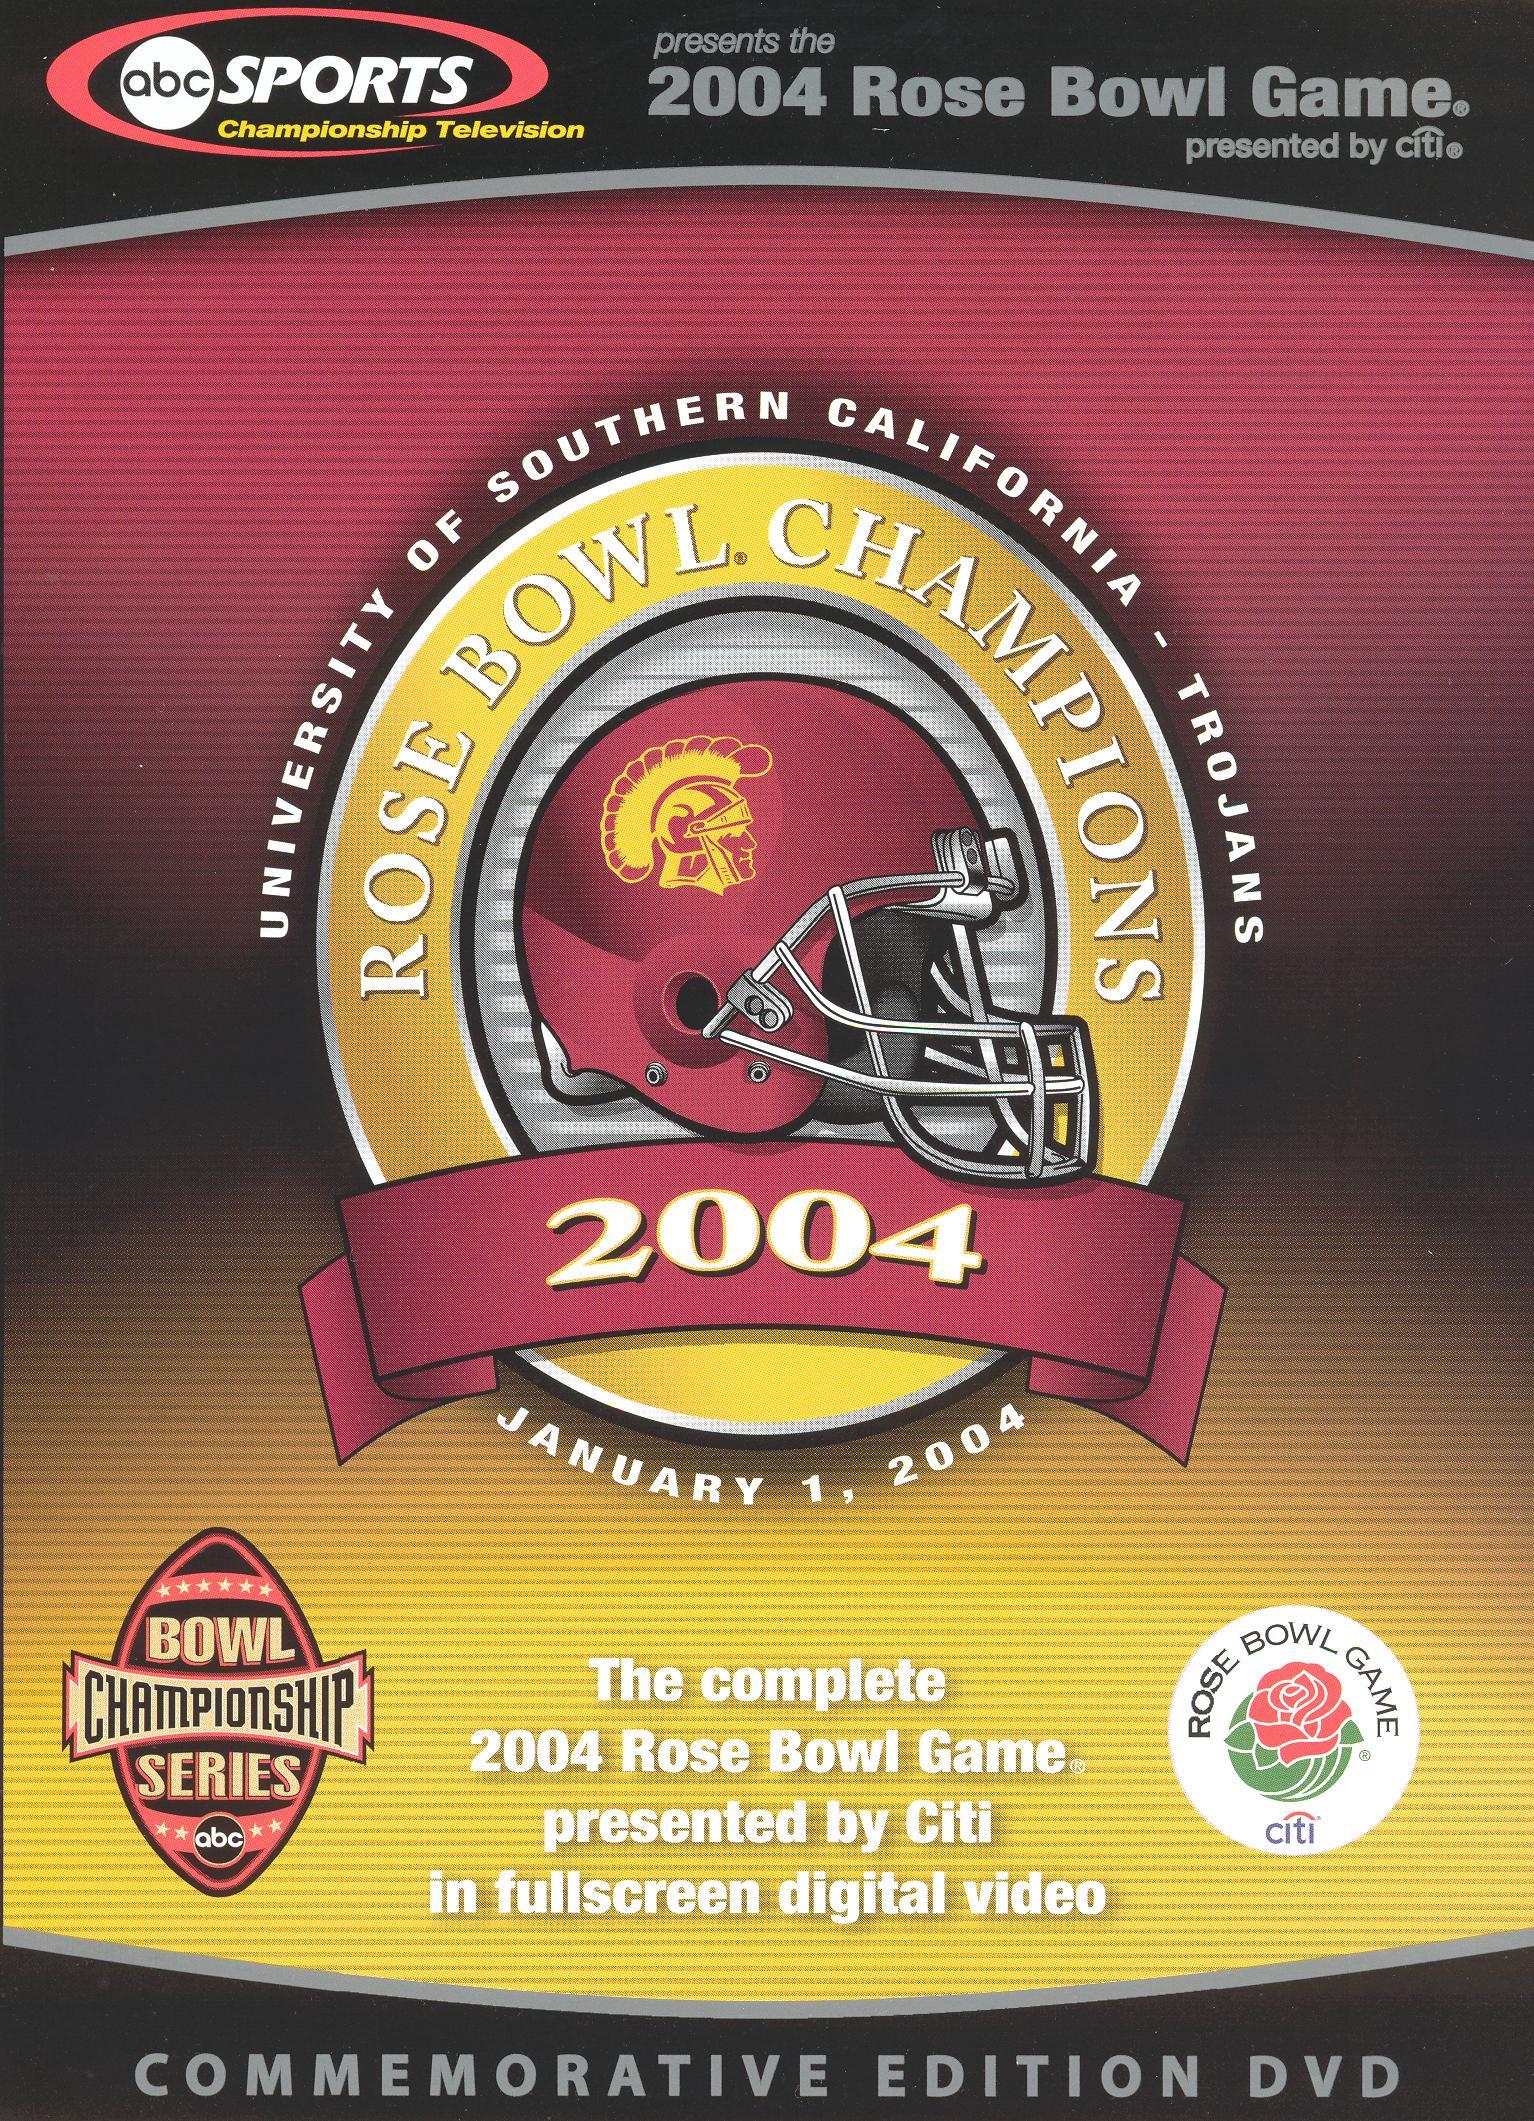 2004 Rose Bowl Champions: University of Southern California - Trojans